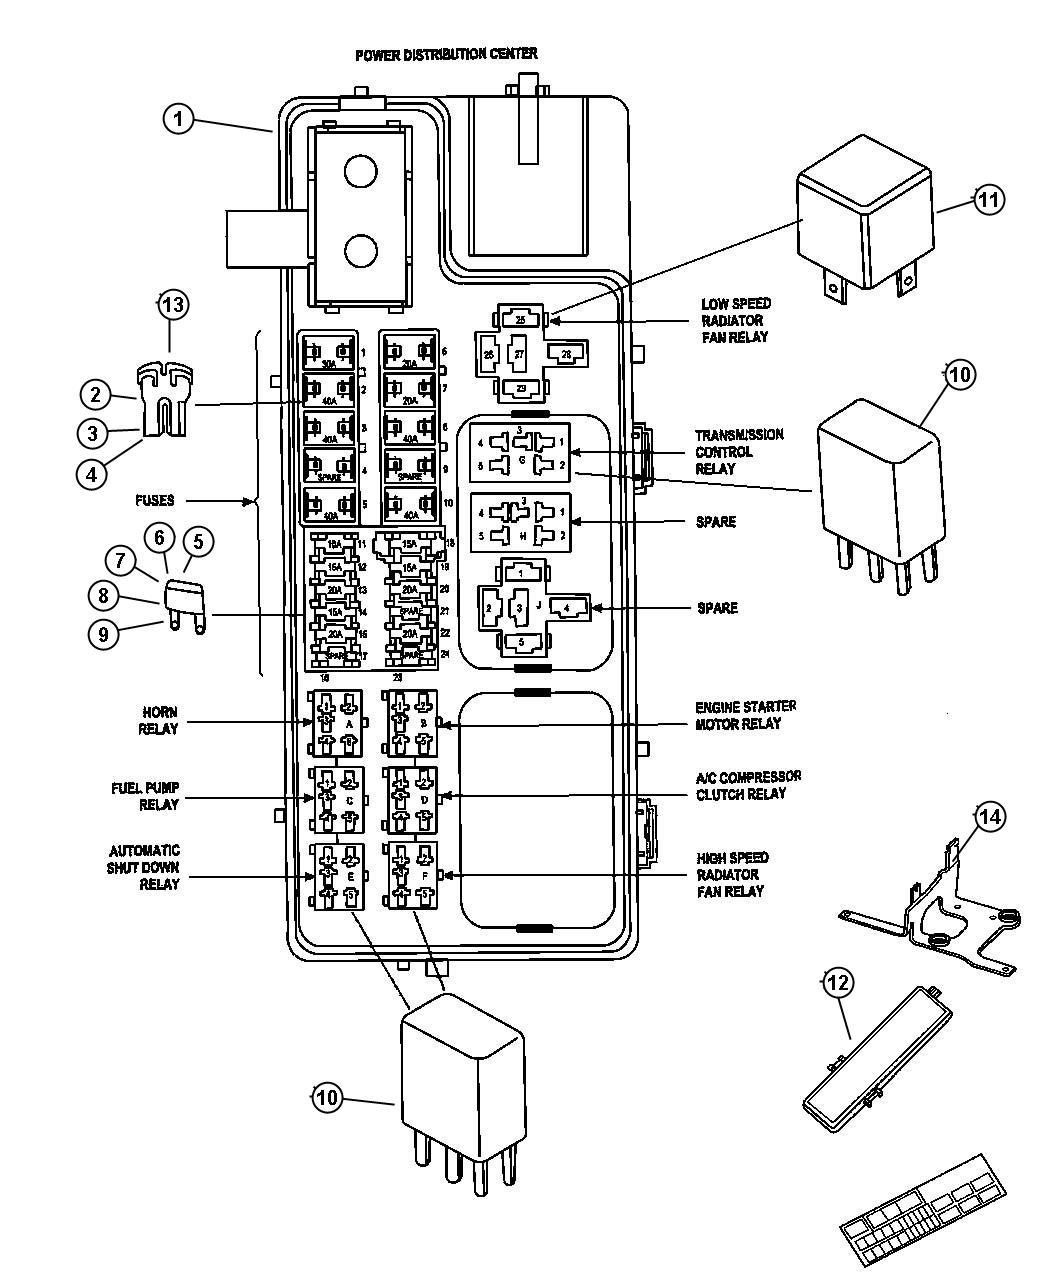 Dodge Ram Fusible Link 140 Amp 140 Amp